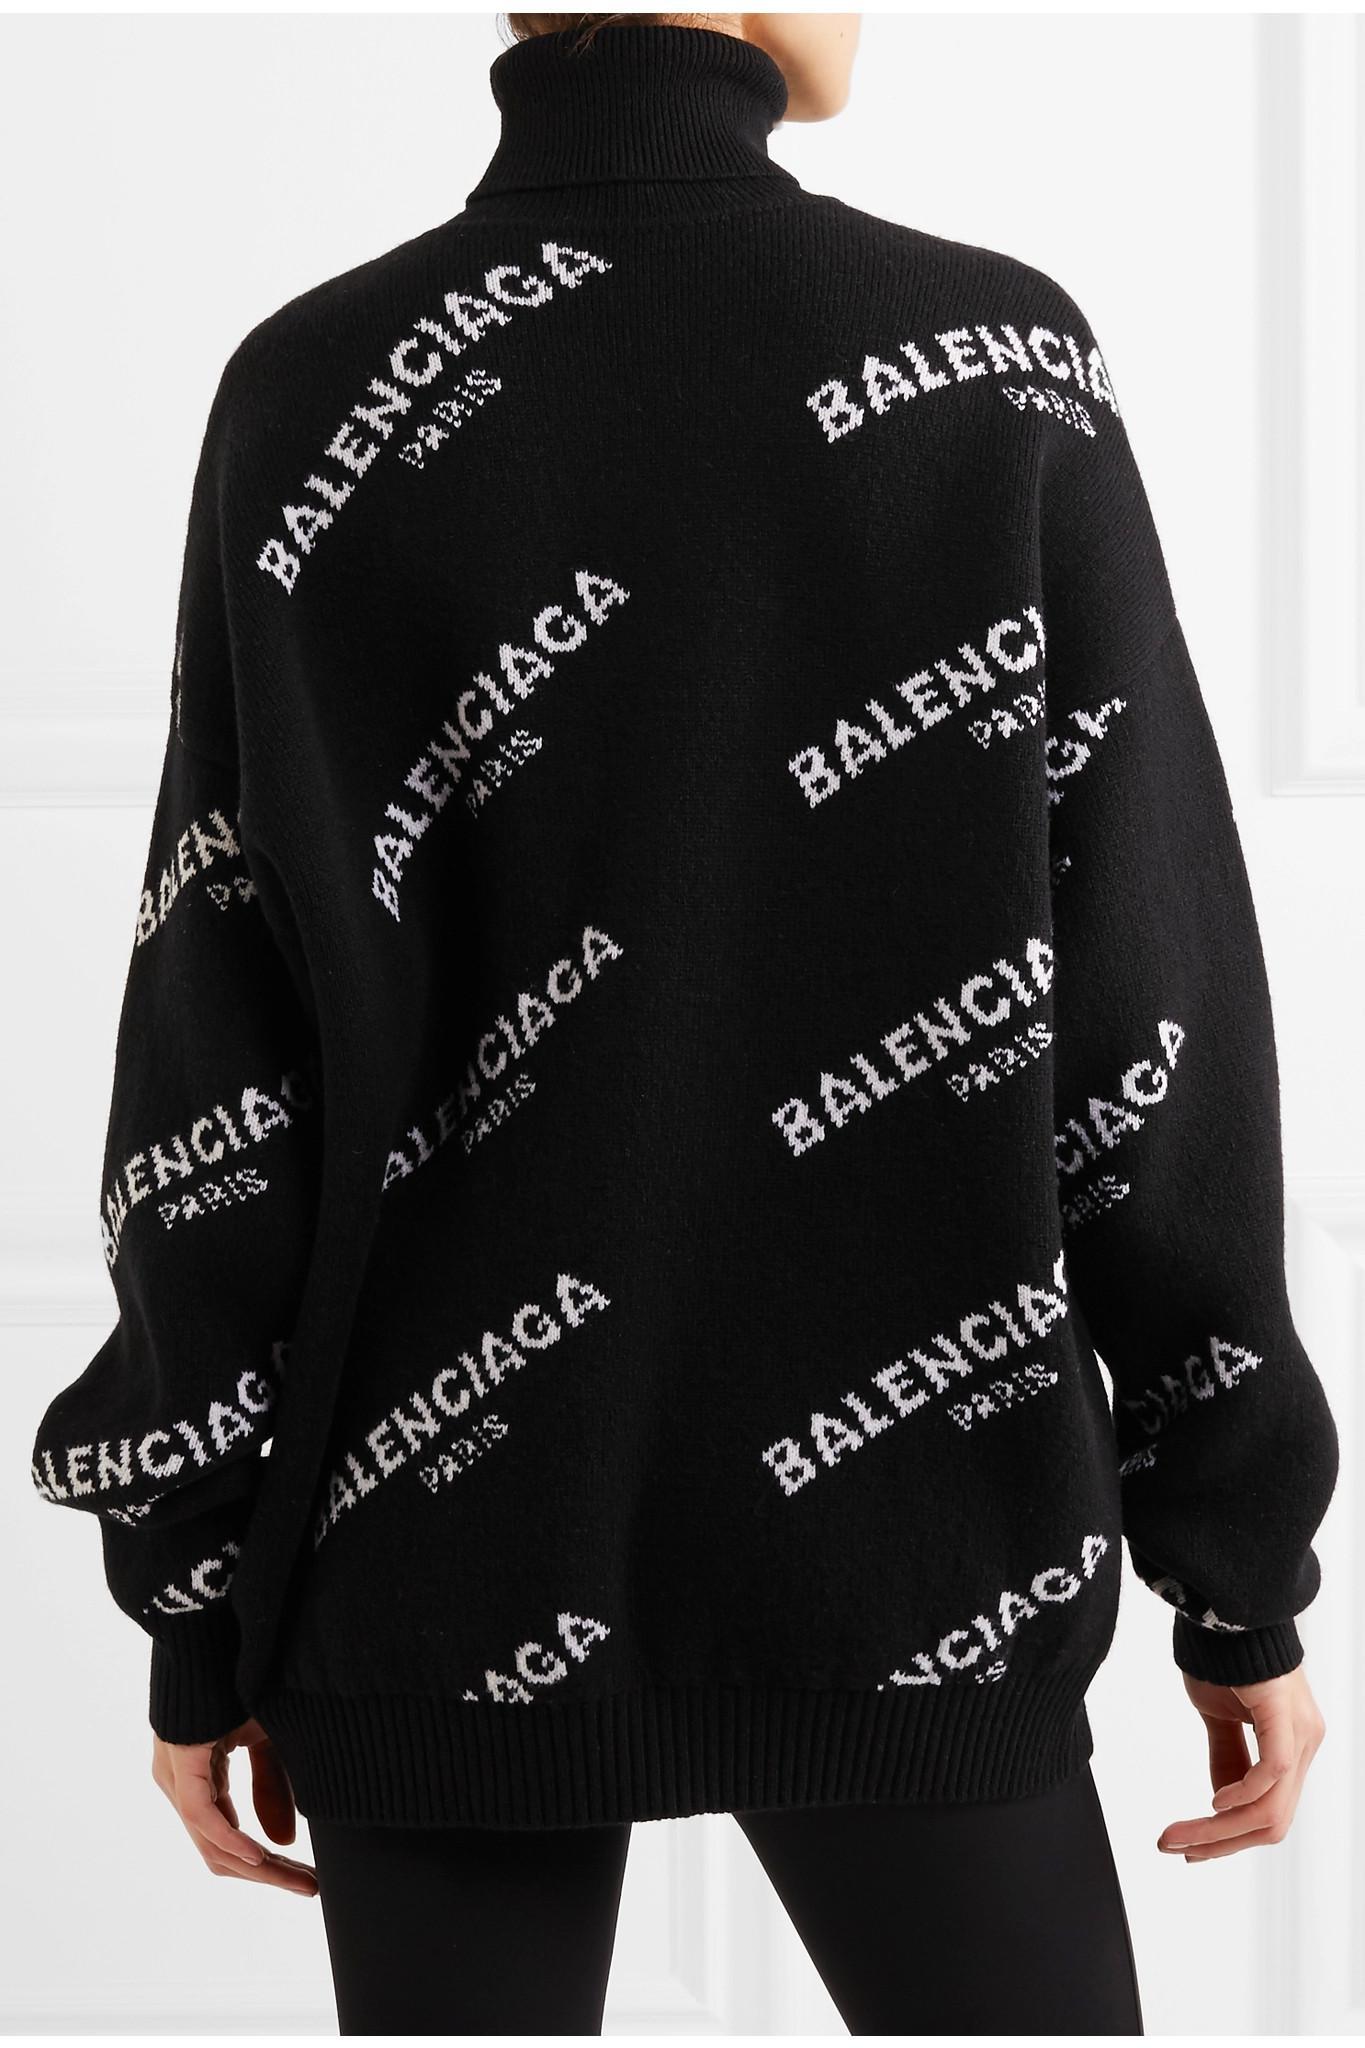 Balenciaga Oversized Intarsia Wool blend Turtleneck